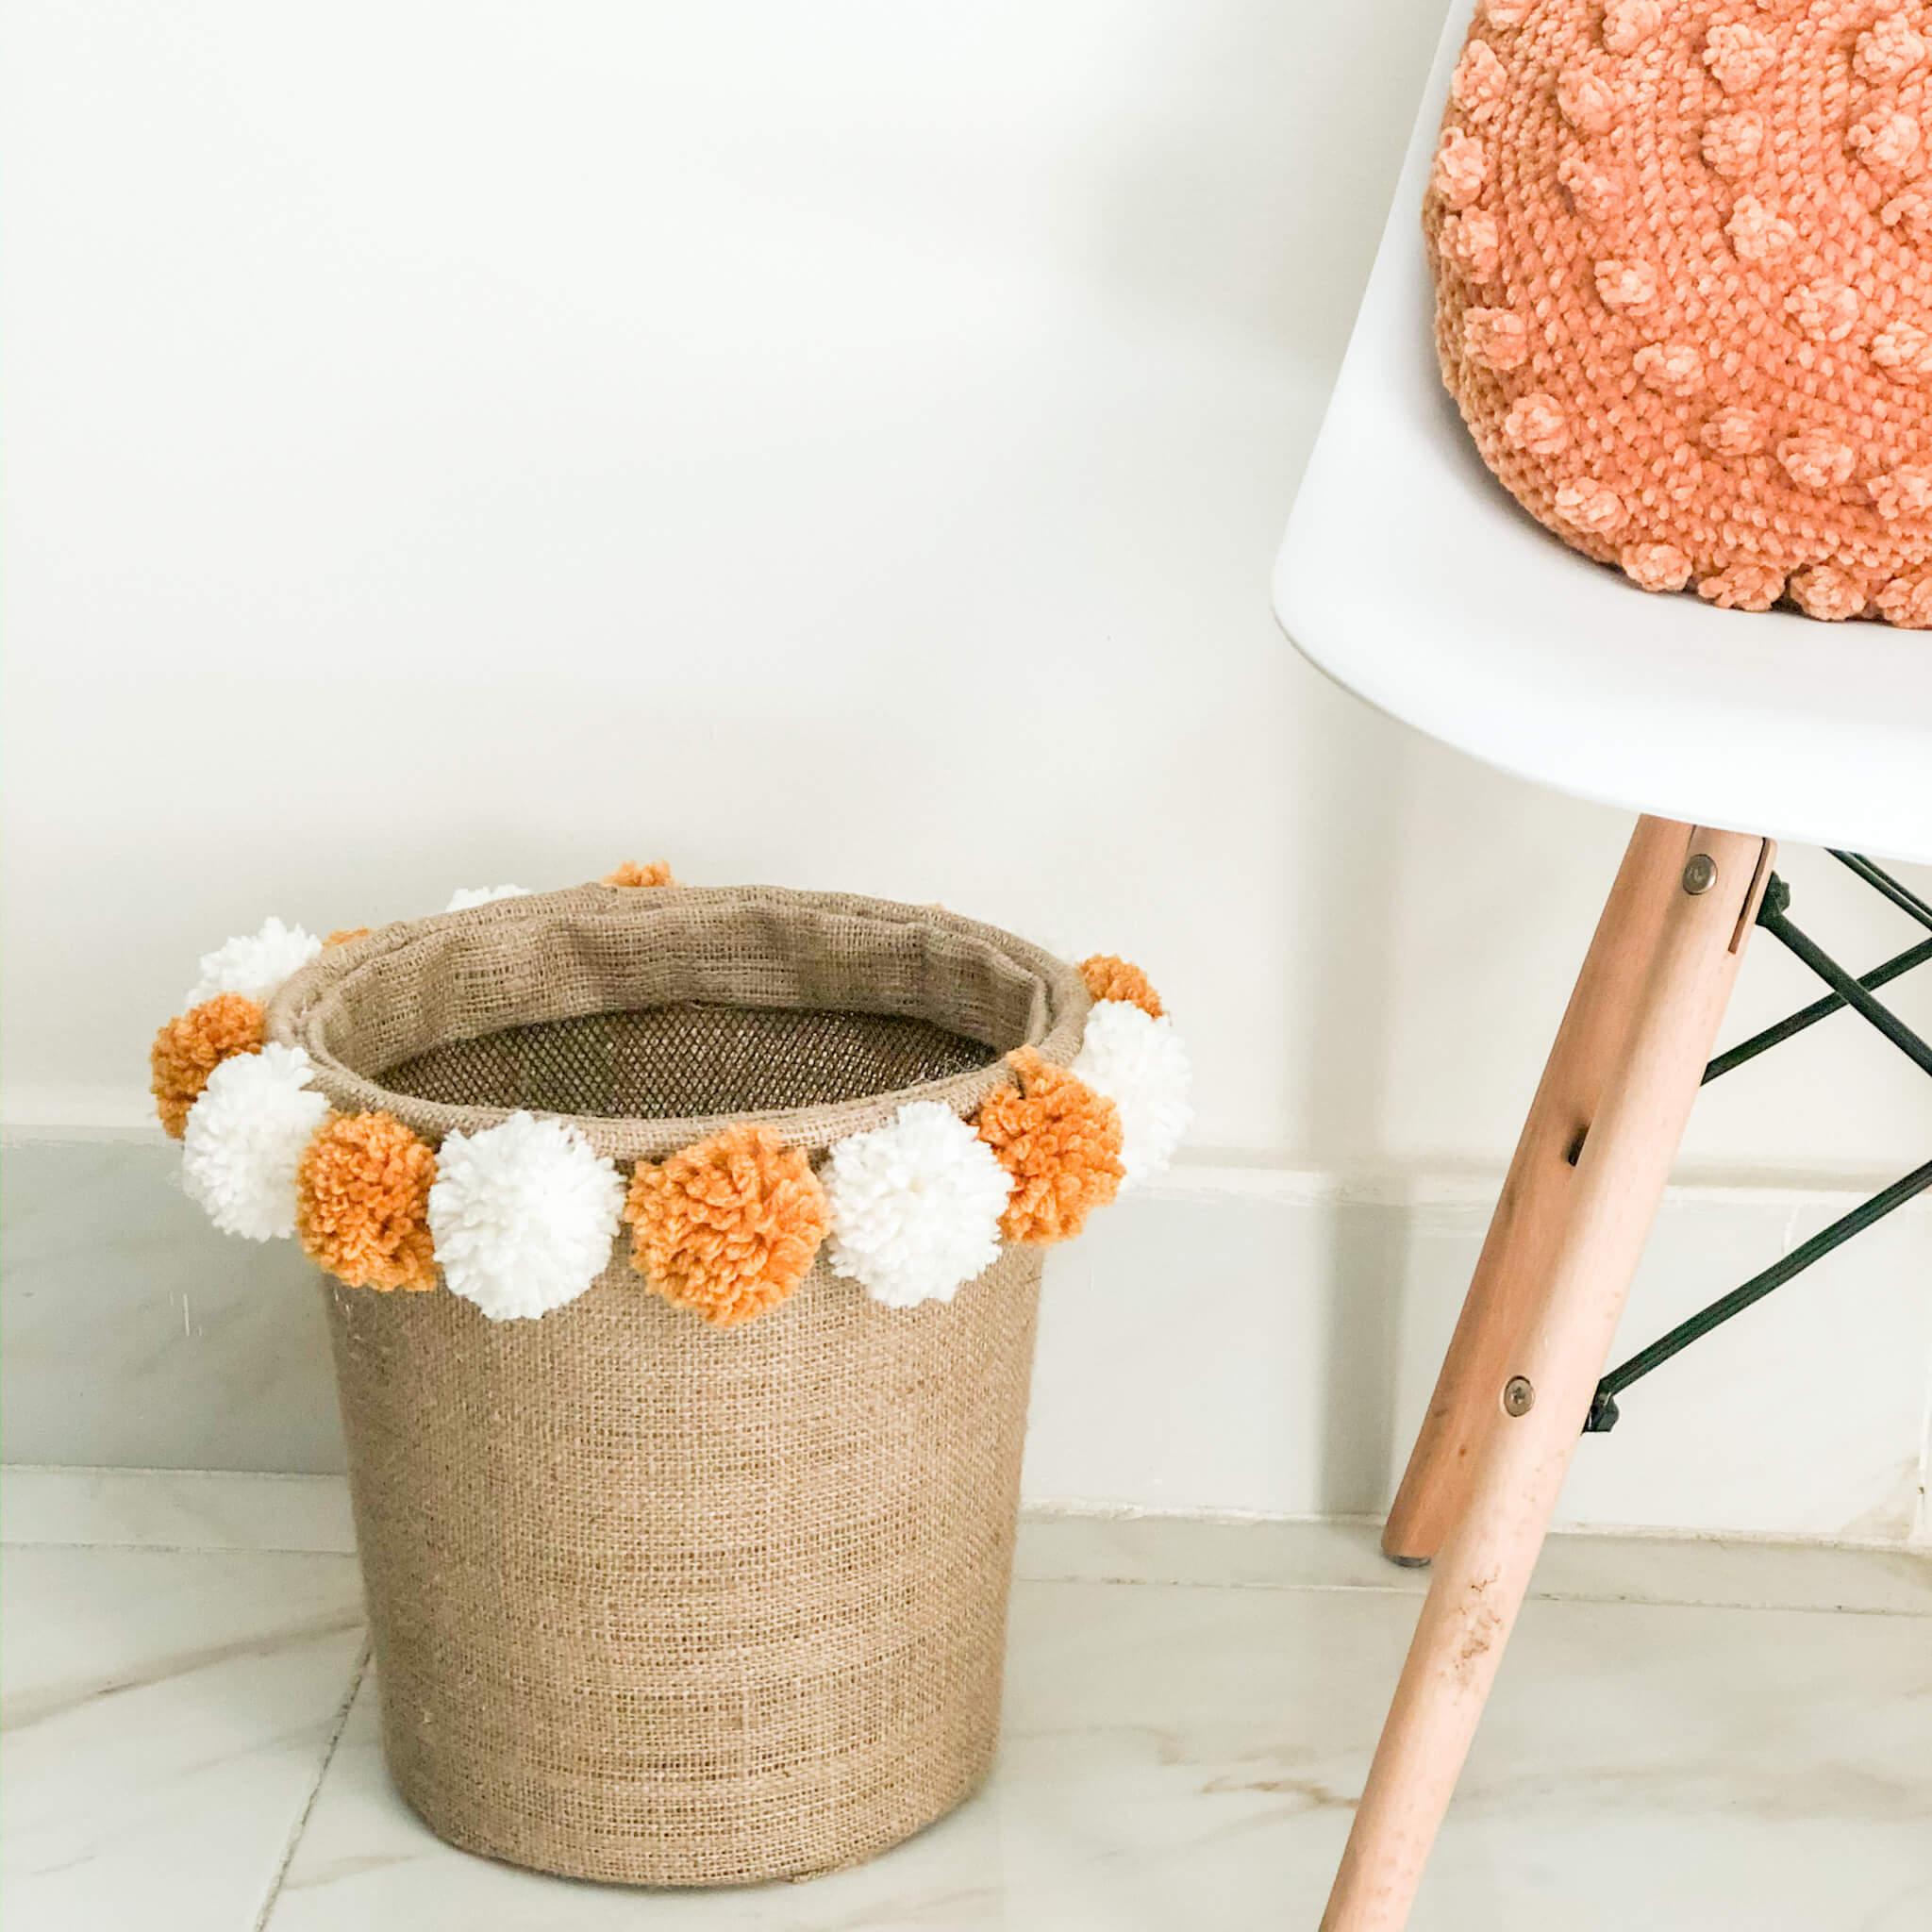 DIY Waste Basket / Trash Can – Photo Tutorial